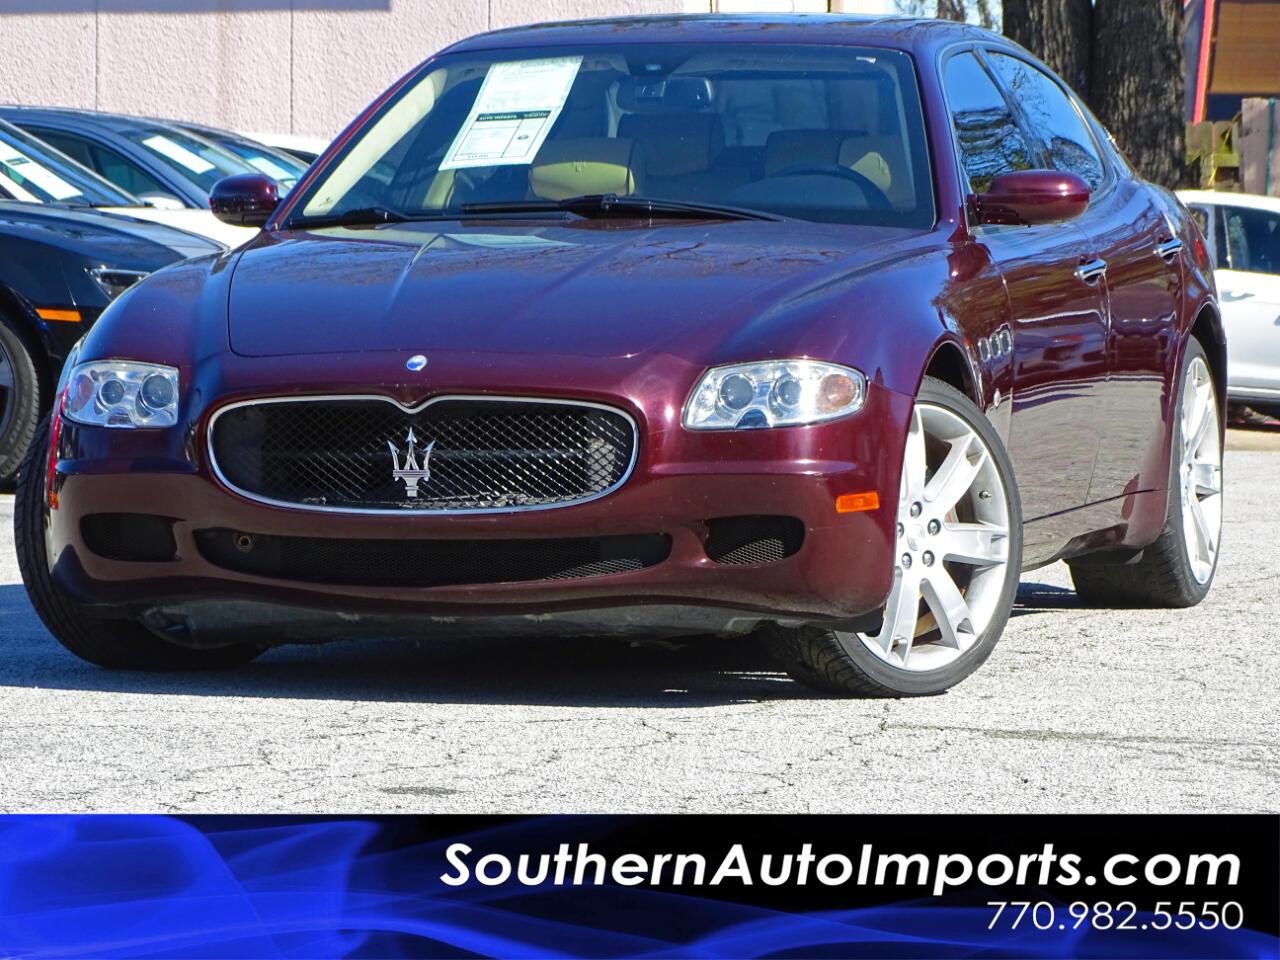 2007 Maserati Quattroporte Executive GT DuoSelect